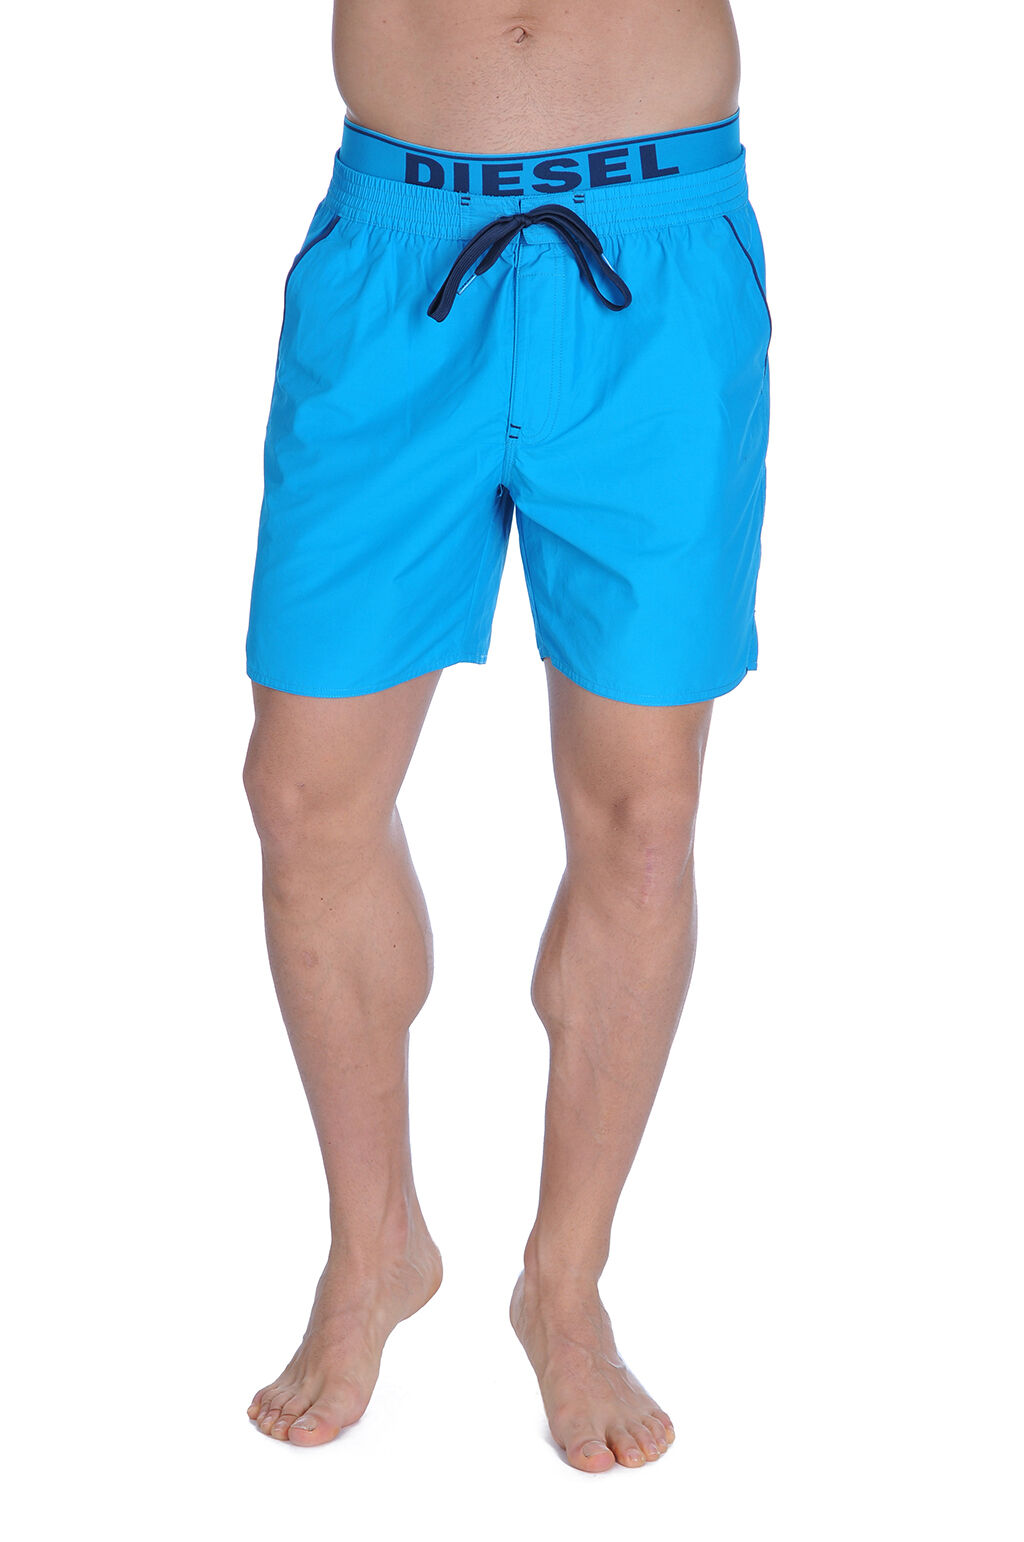 18cdf431c66 Details about Diesel Dolphin Swim Shorts CMFVOQACJ - Turquoise